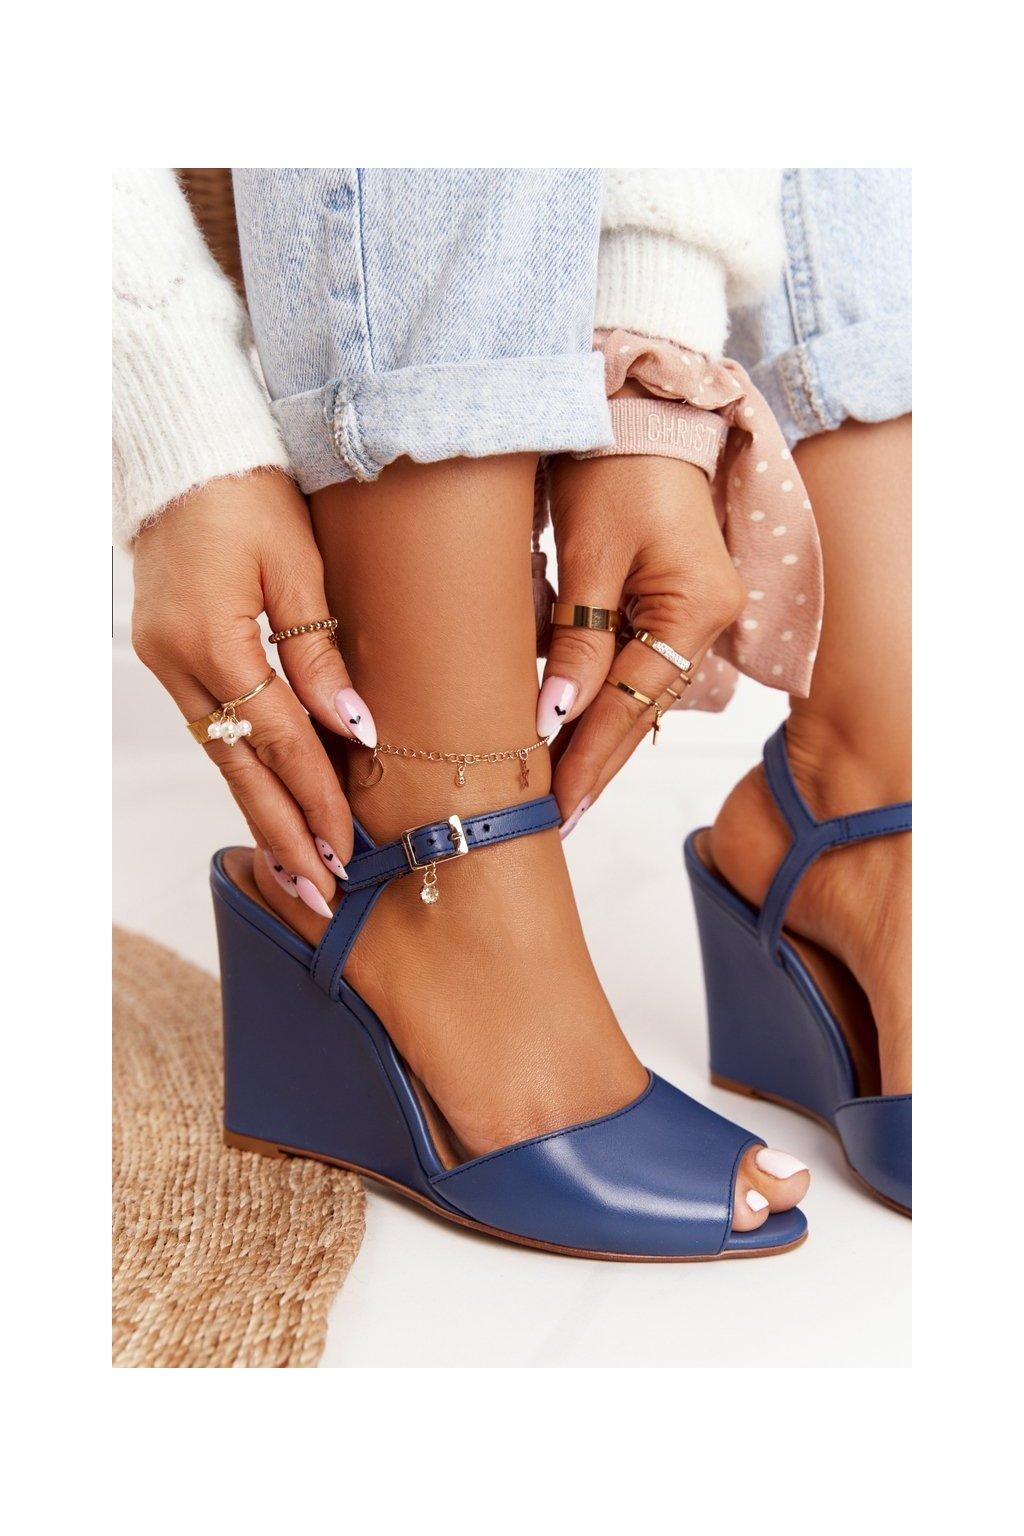 Dámske sandále na podpätku farba modrá kód obuvi 2253 114 NAVY